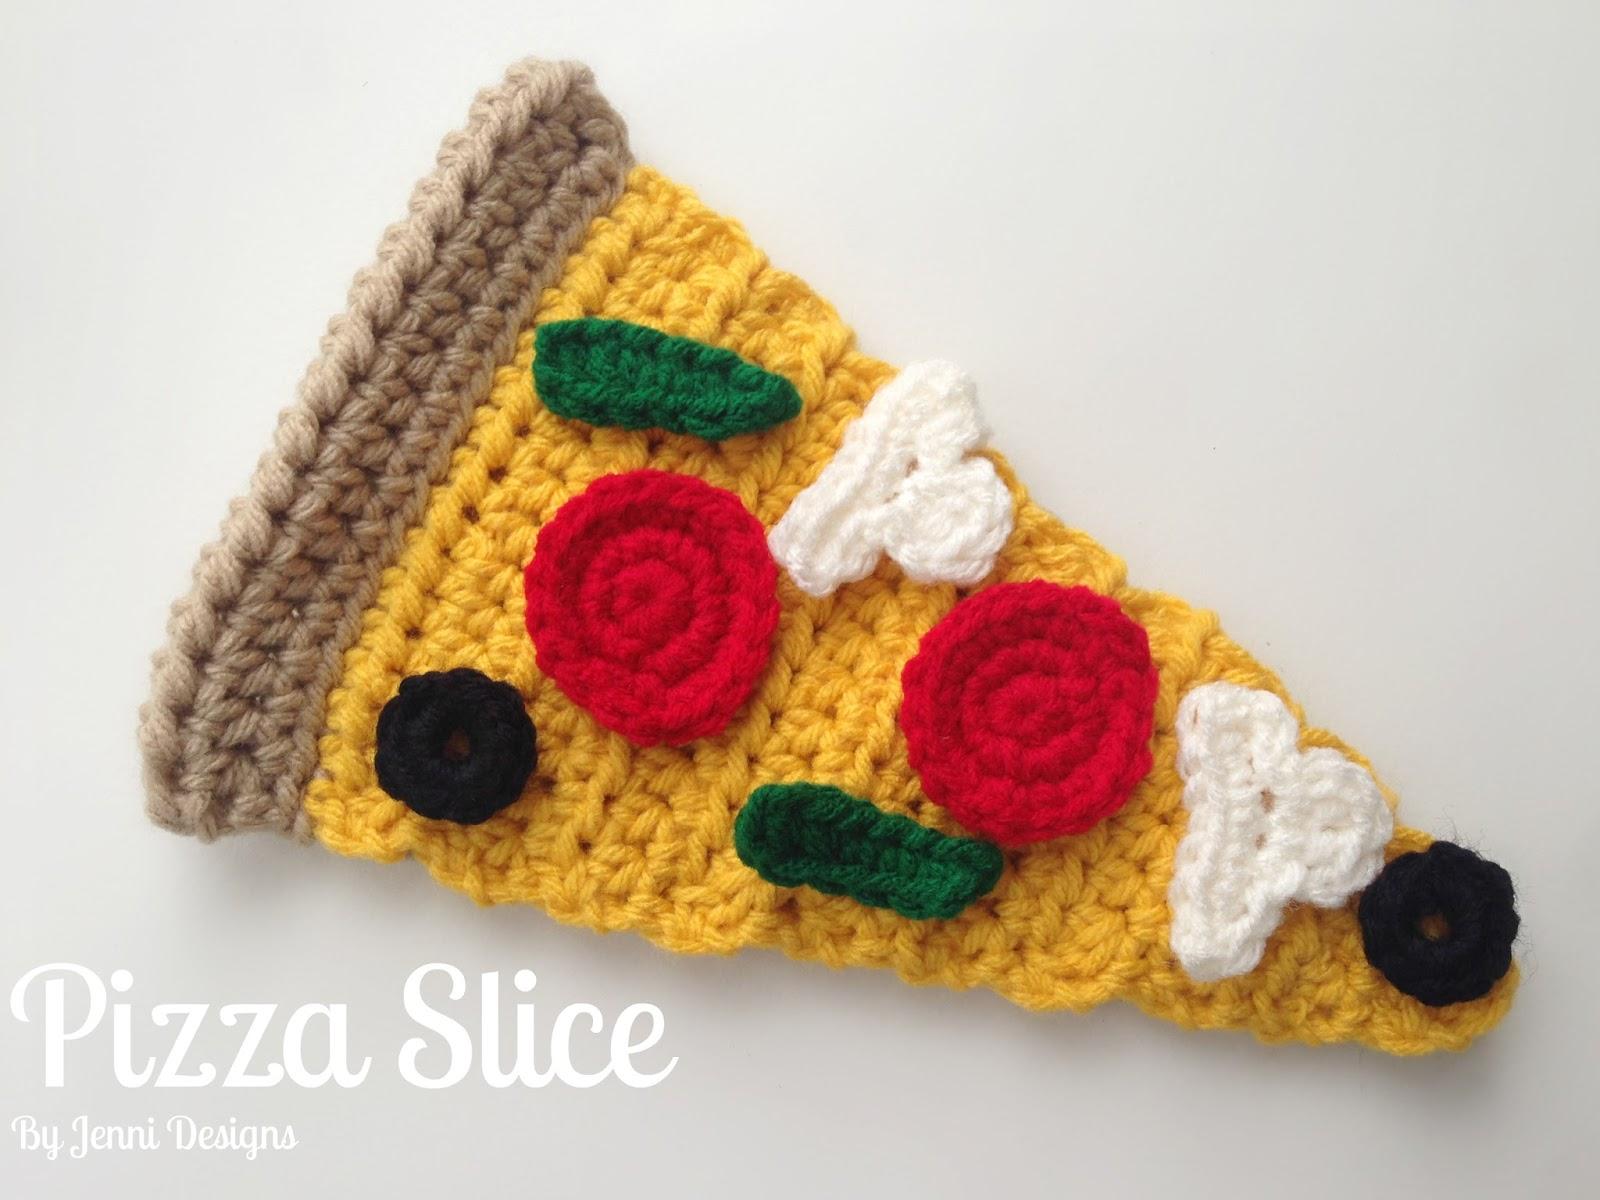 By Jenni Designs: Free Crochet Pattern: Pizza Slice & Toppings